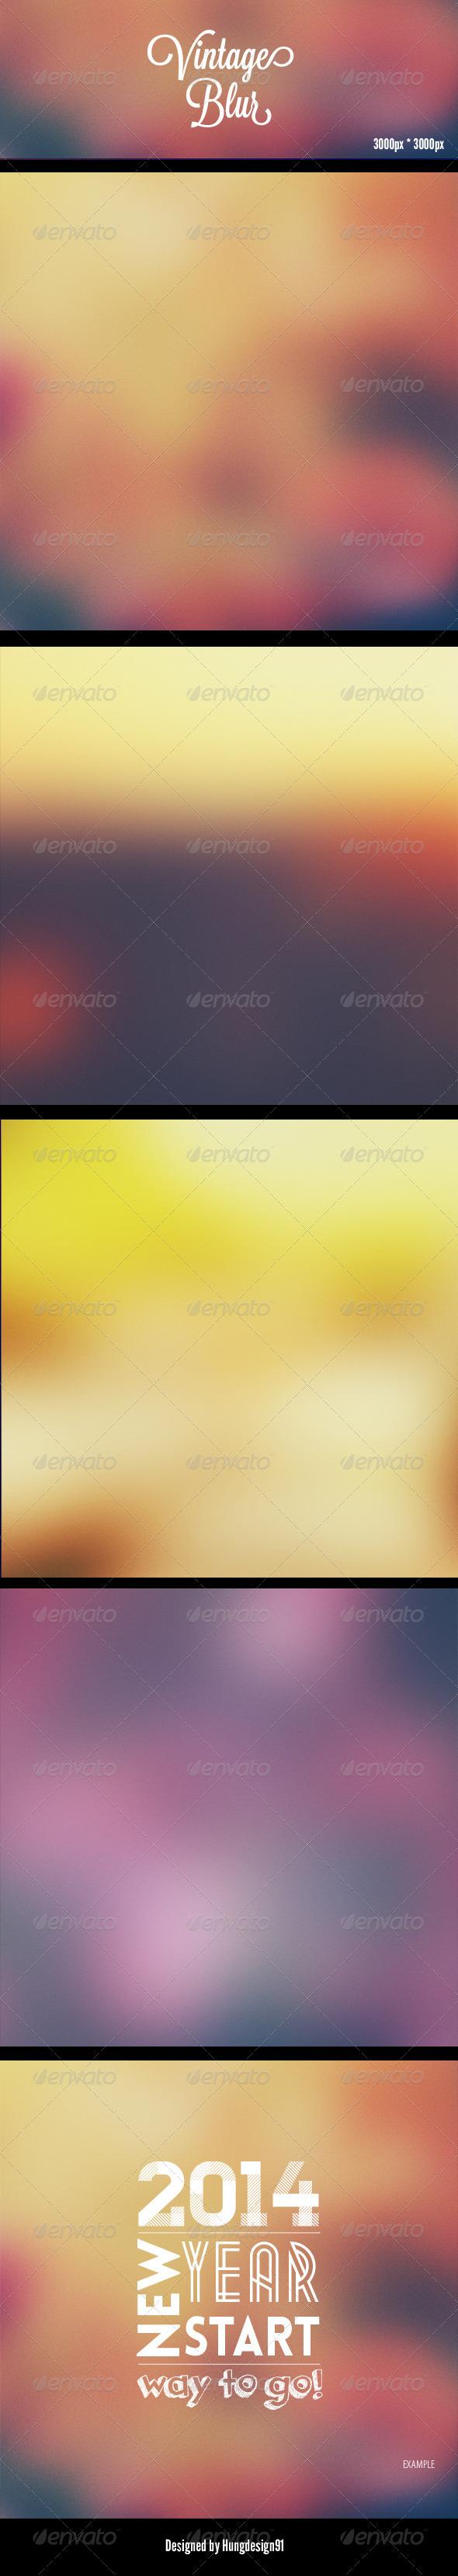 GraphicRiver Vintage Blur Backgrounds HD 7808824